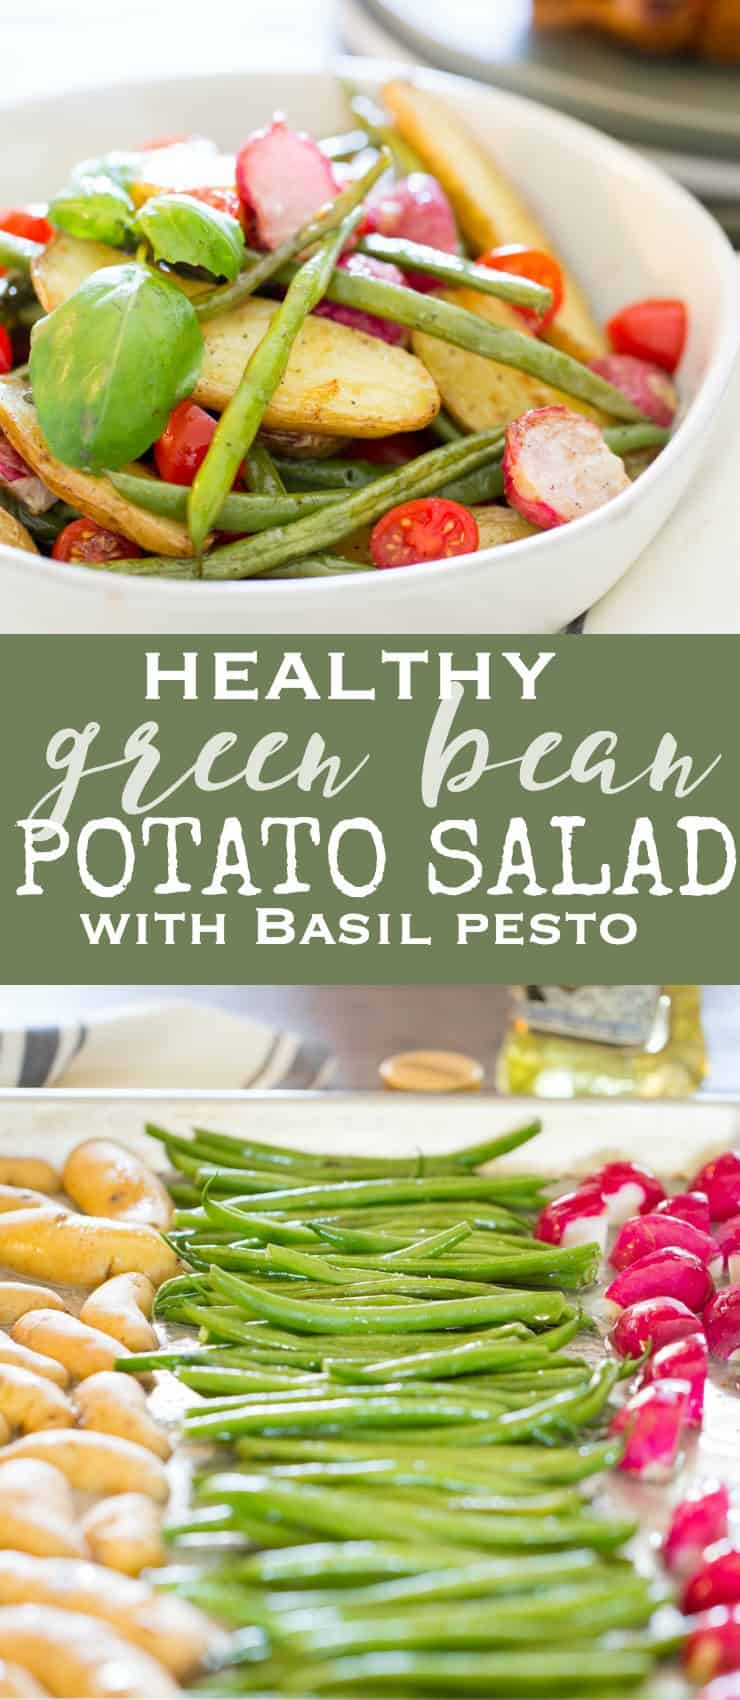 healthy potato salad recipe with green beans and basil pesto